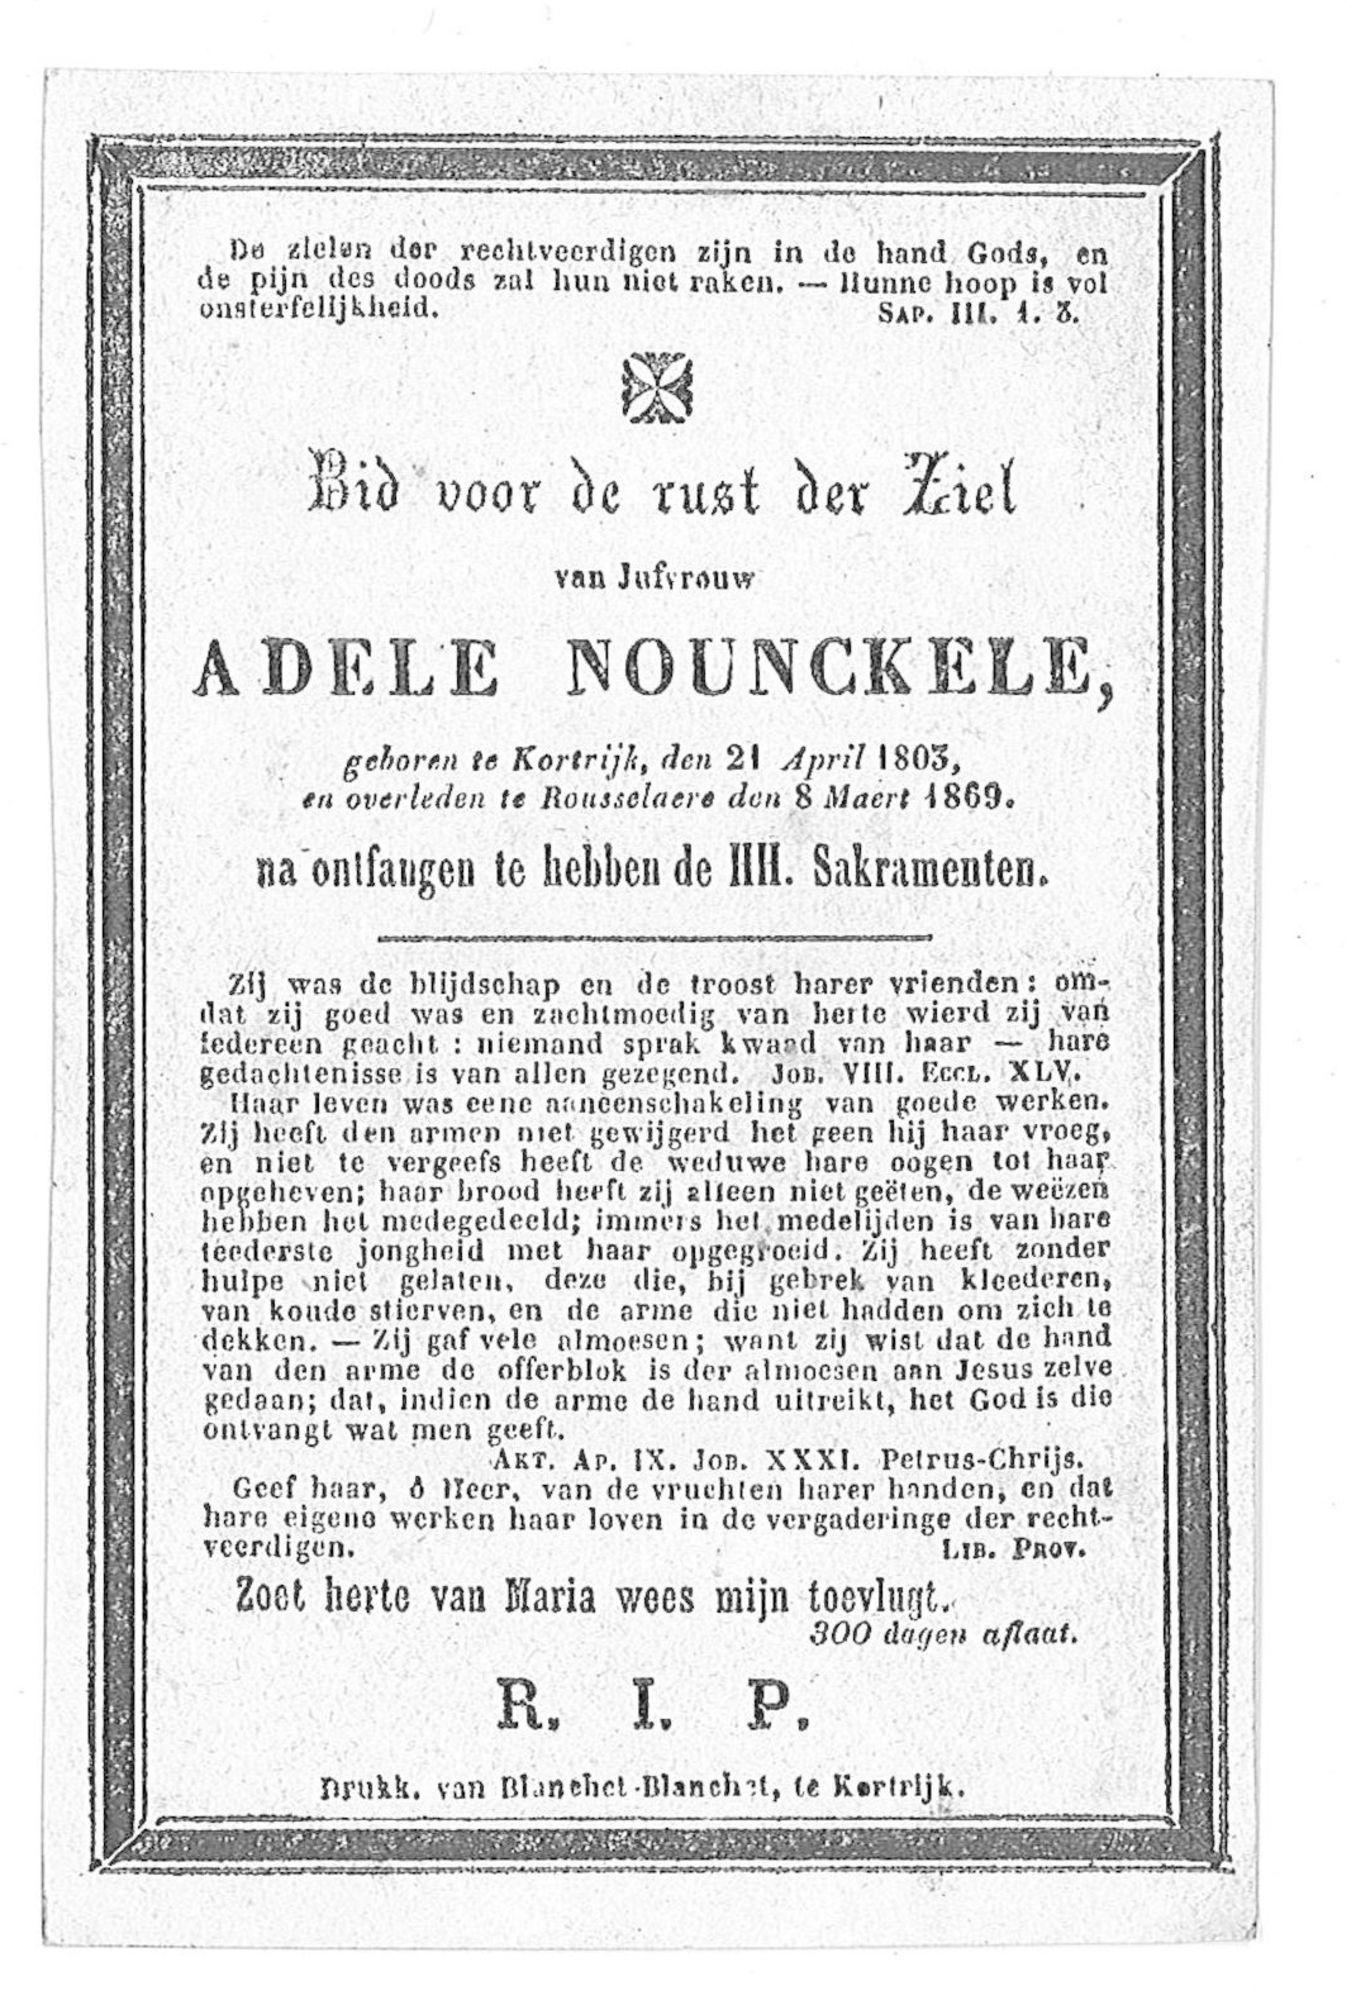 Adele Nounckele